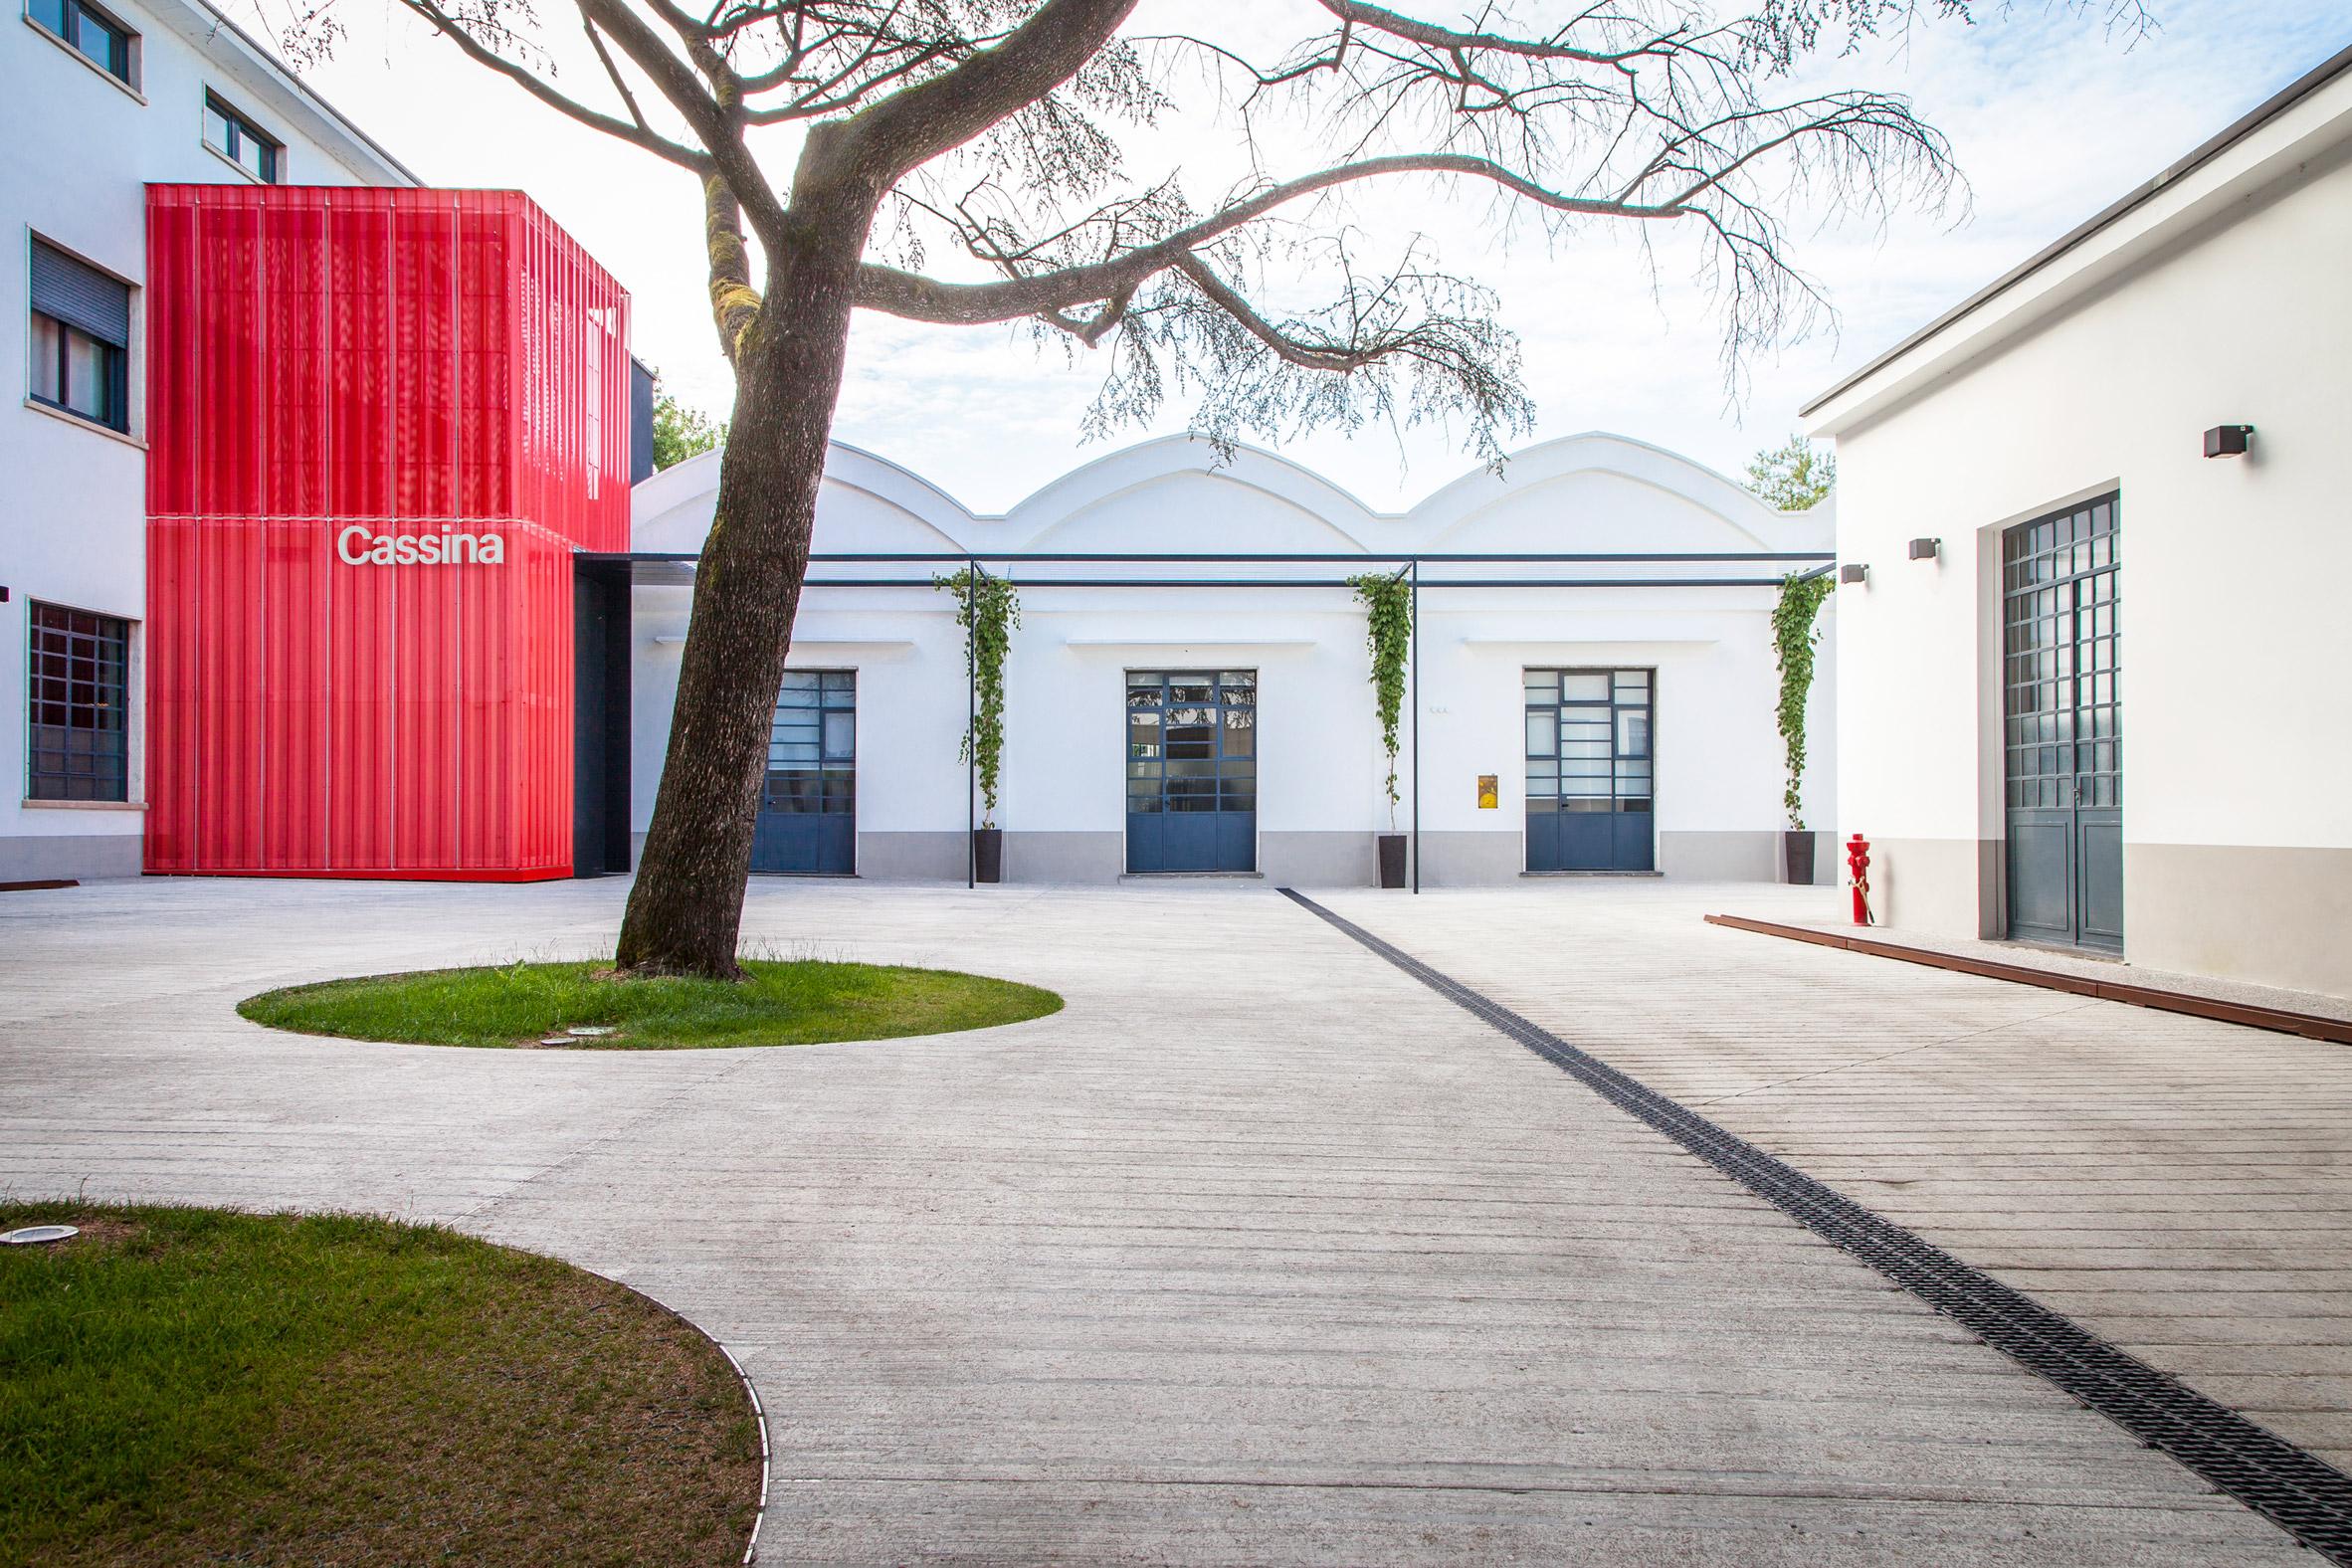 Cassina headquarters by Patricia Uriquiola